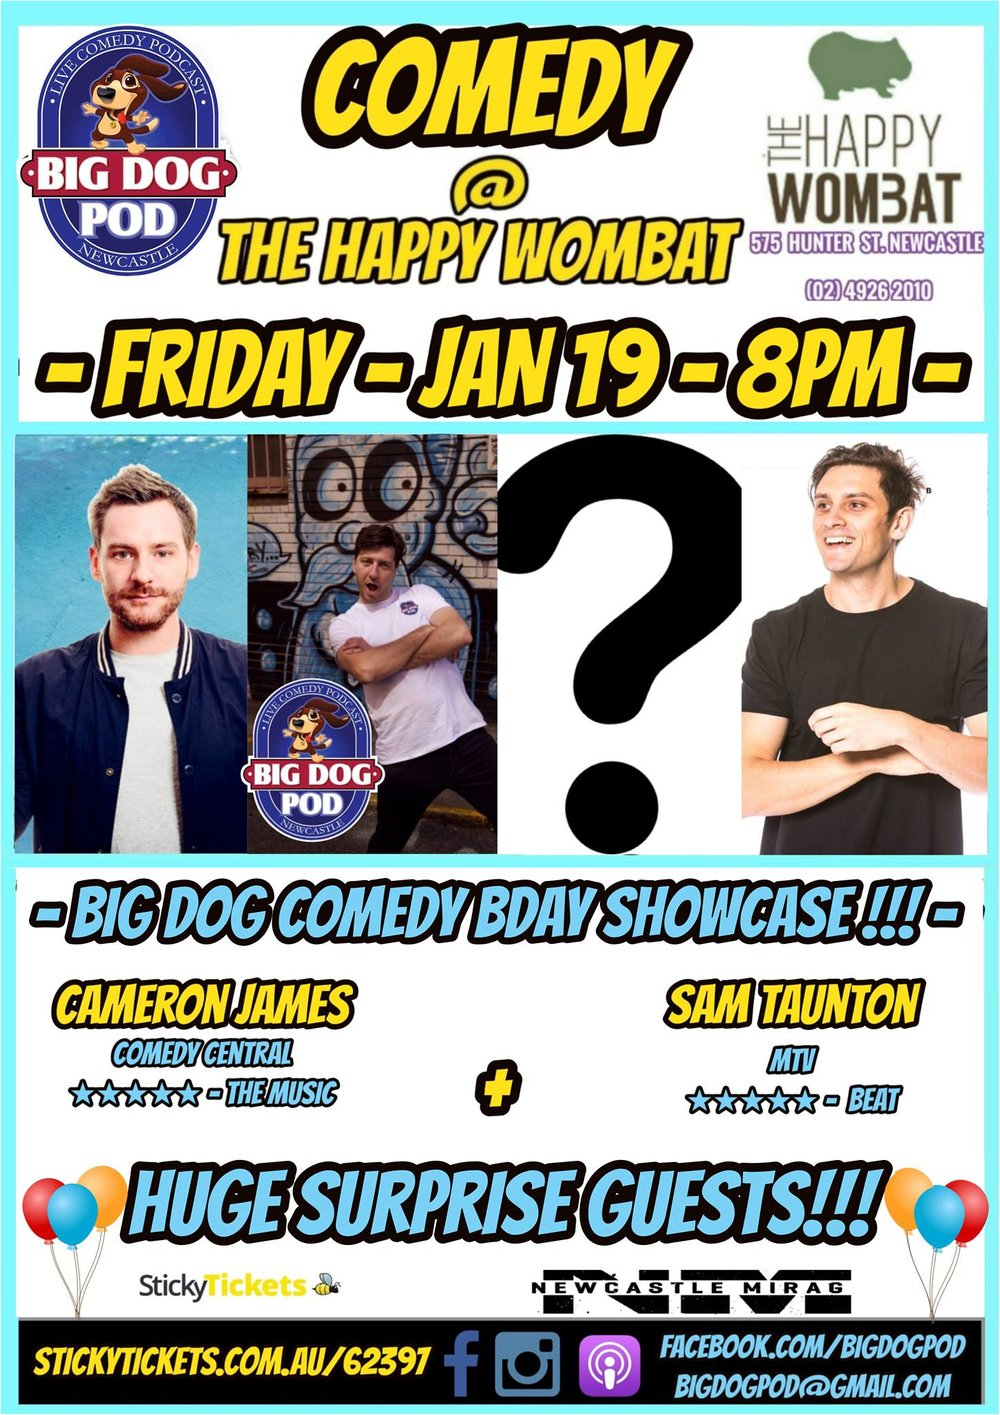 Bid Dog Pod comedy The Happy Womabt